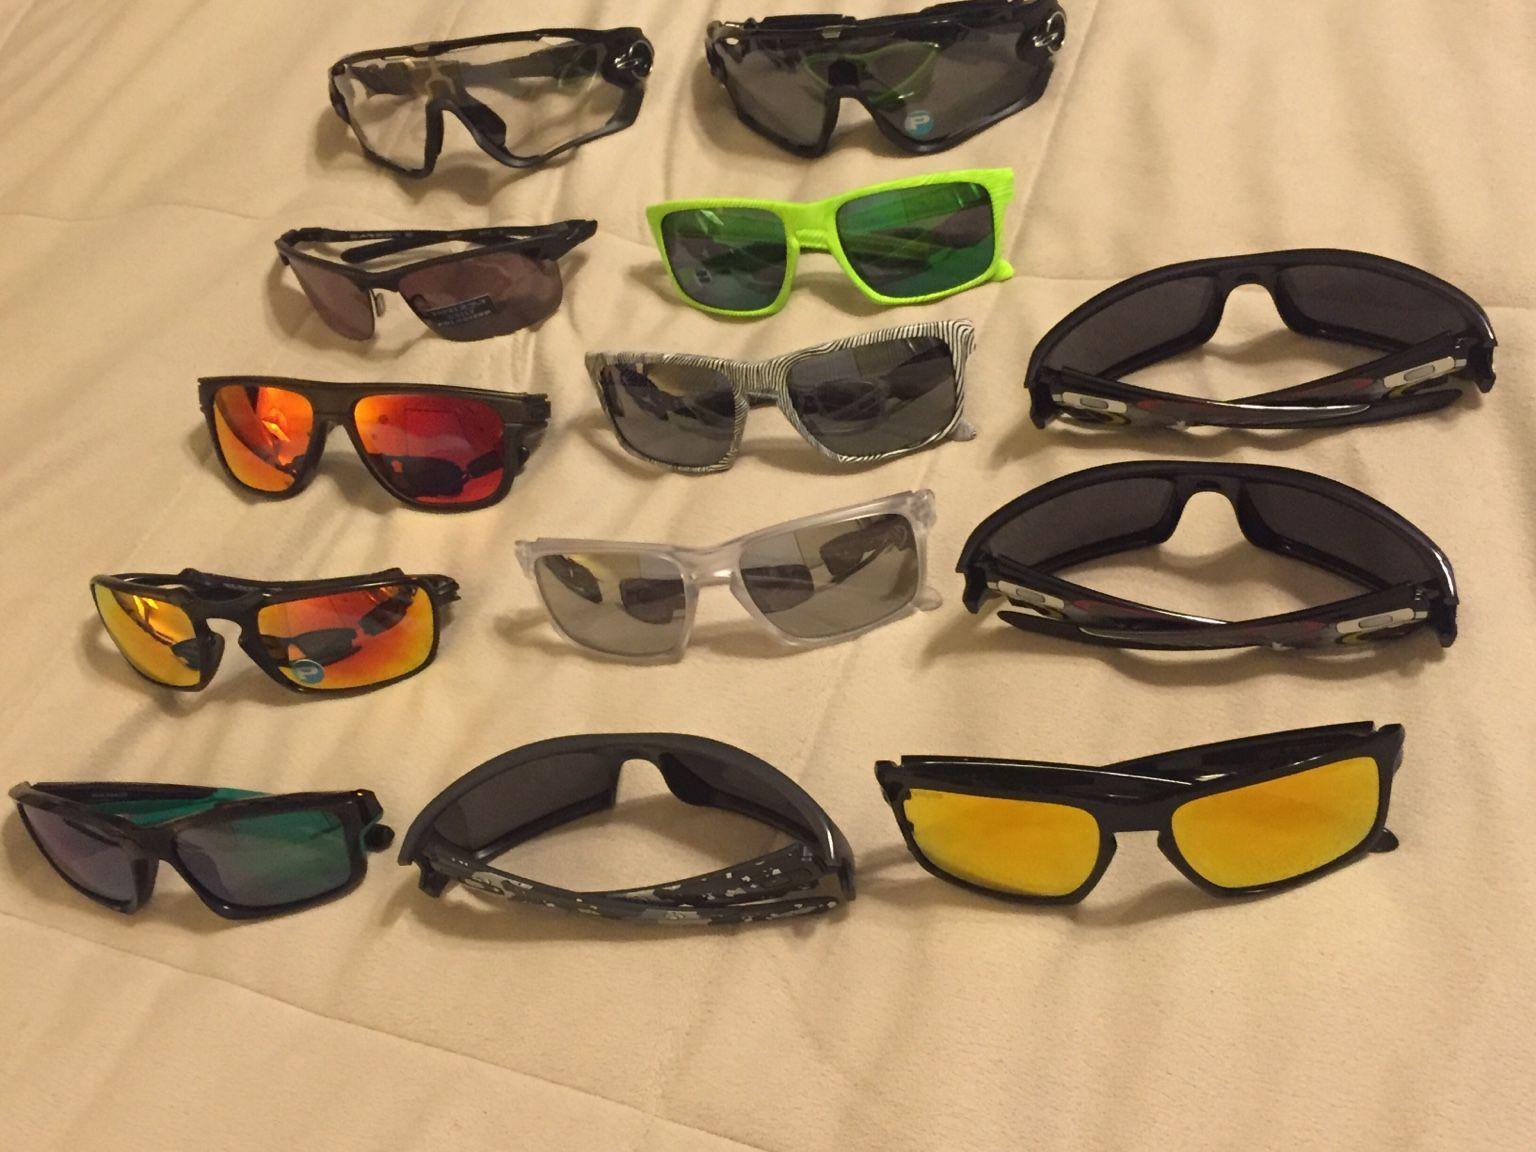 BOGO!!!!!  NEW ADDS!!! Buy one get one (=\<) HALF off!!!!! - d38052aaa9821b827f155cd1aeb1afc9.jpg